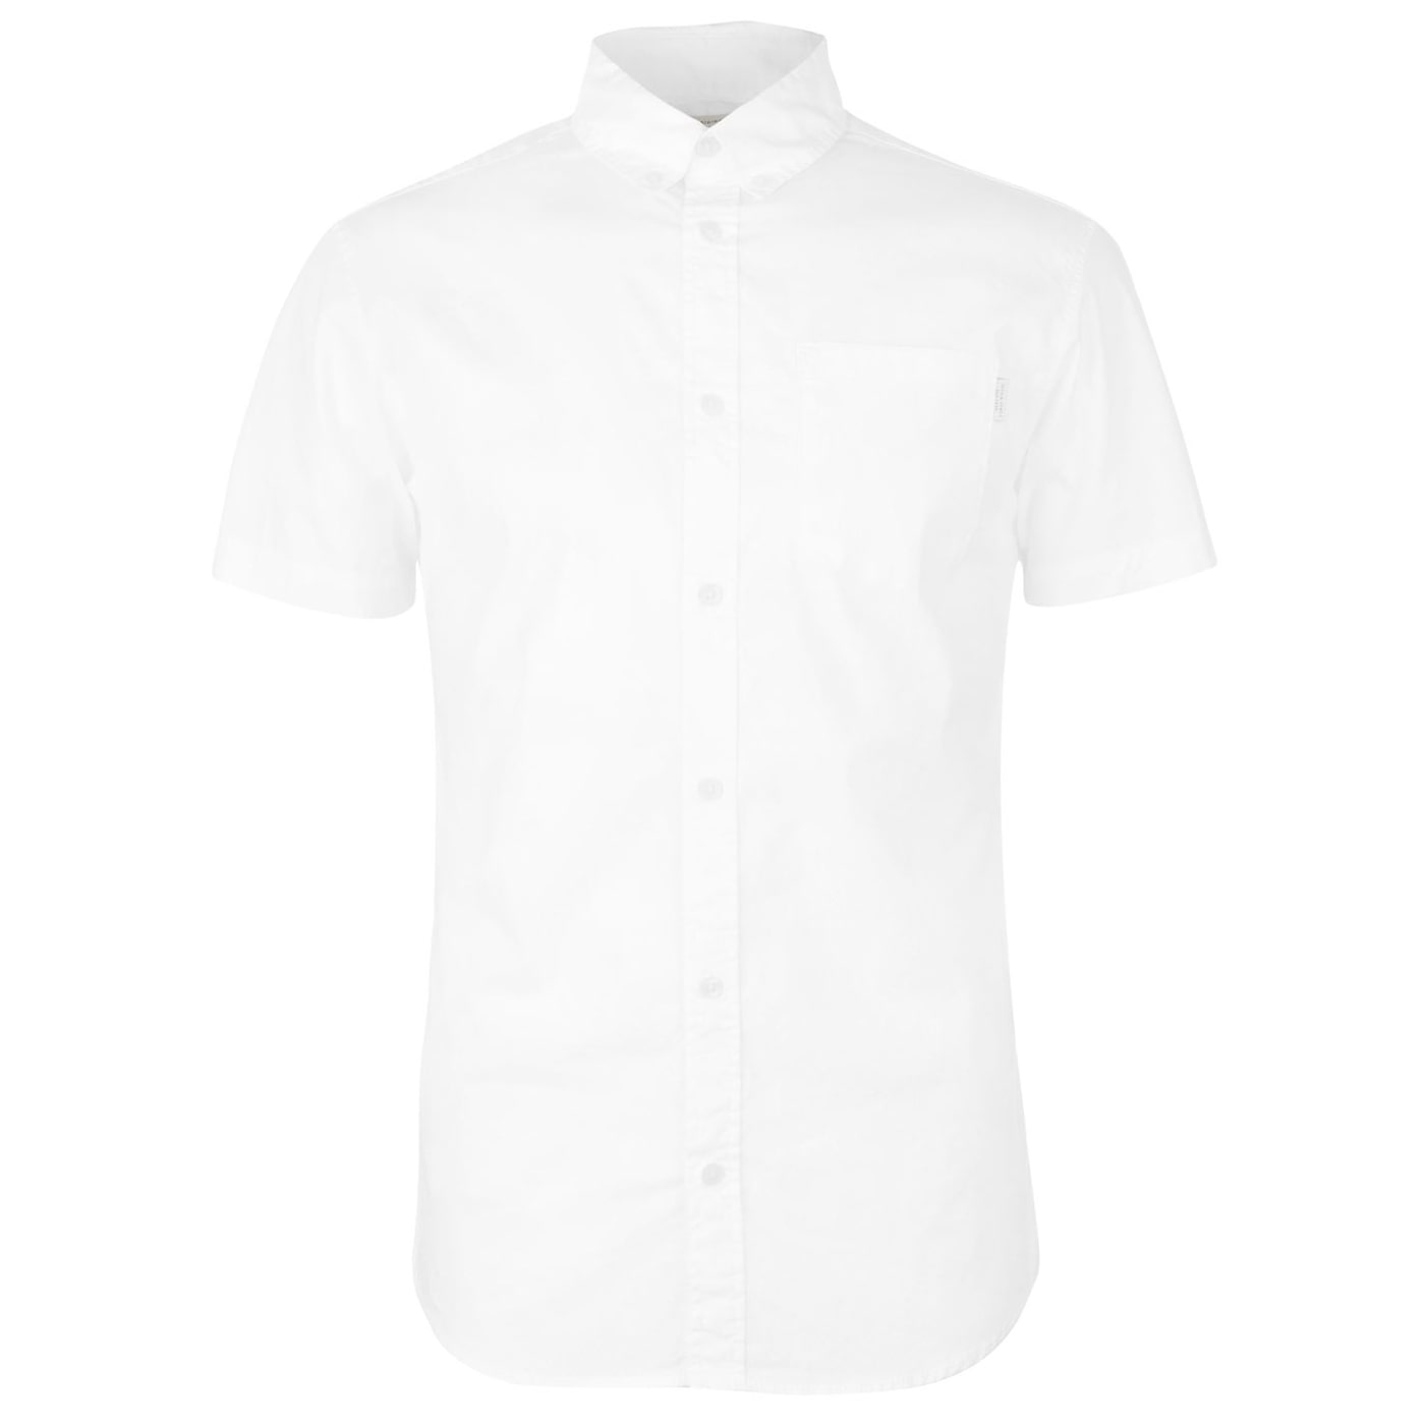 Jack and Jones Originals Short Sleeve Shirt